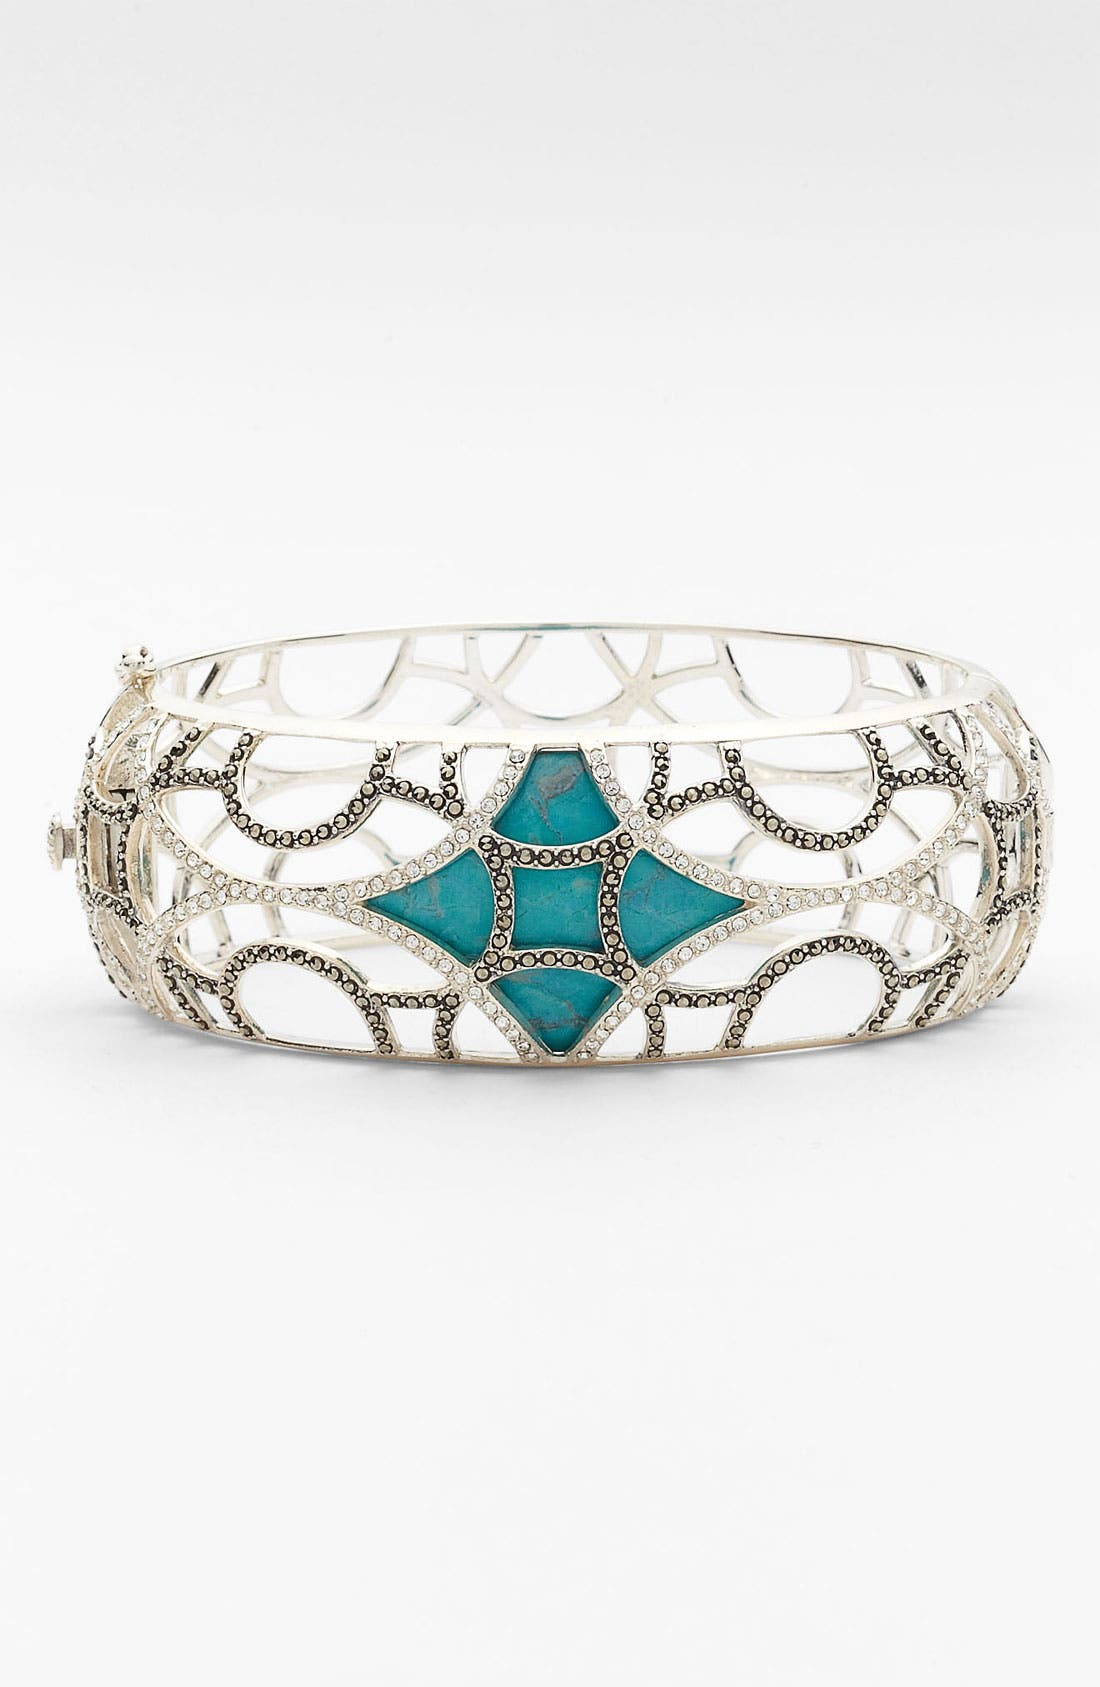 Main Image - Judith Jack 'Turq' Hinged Bracelet